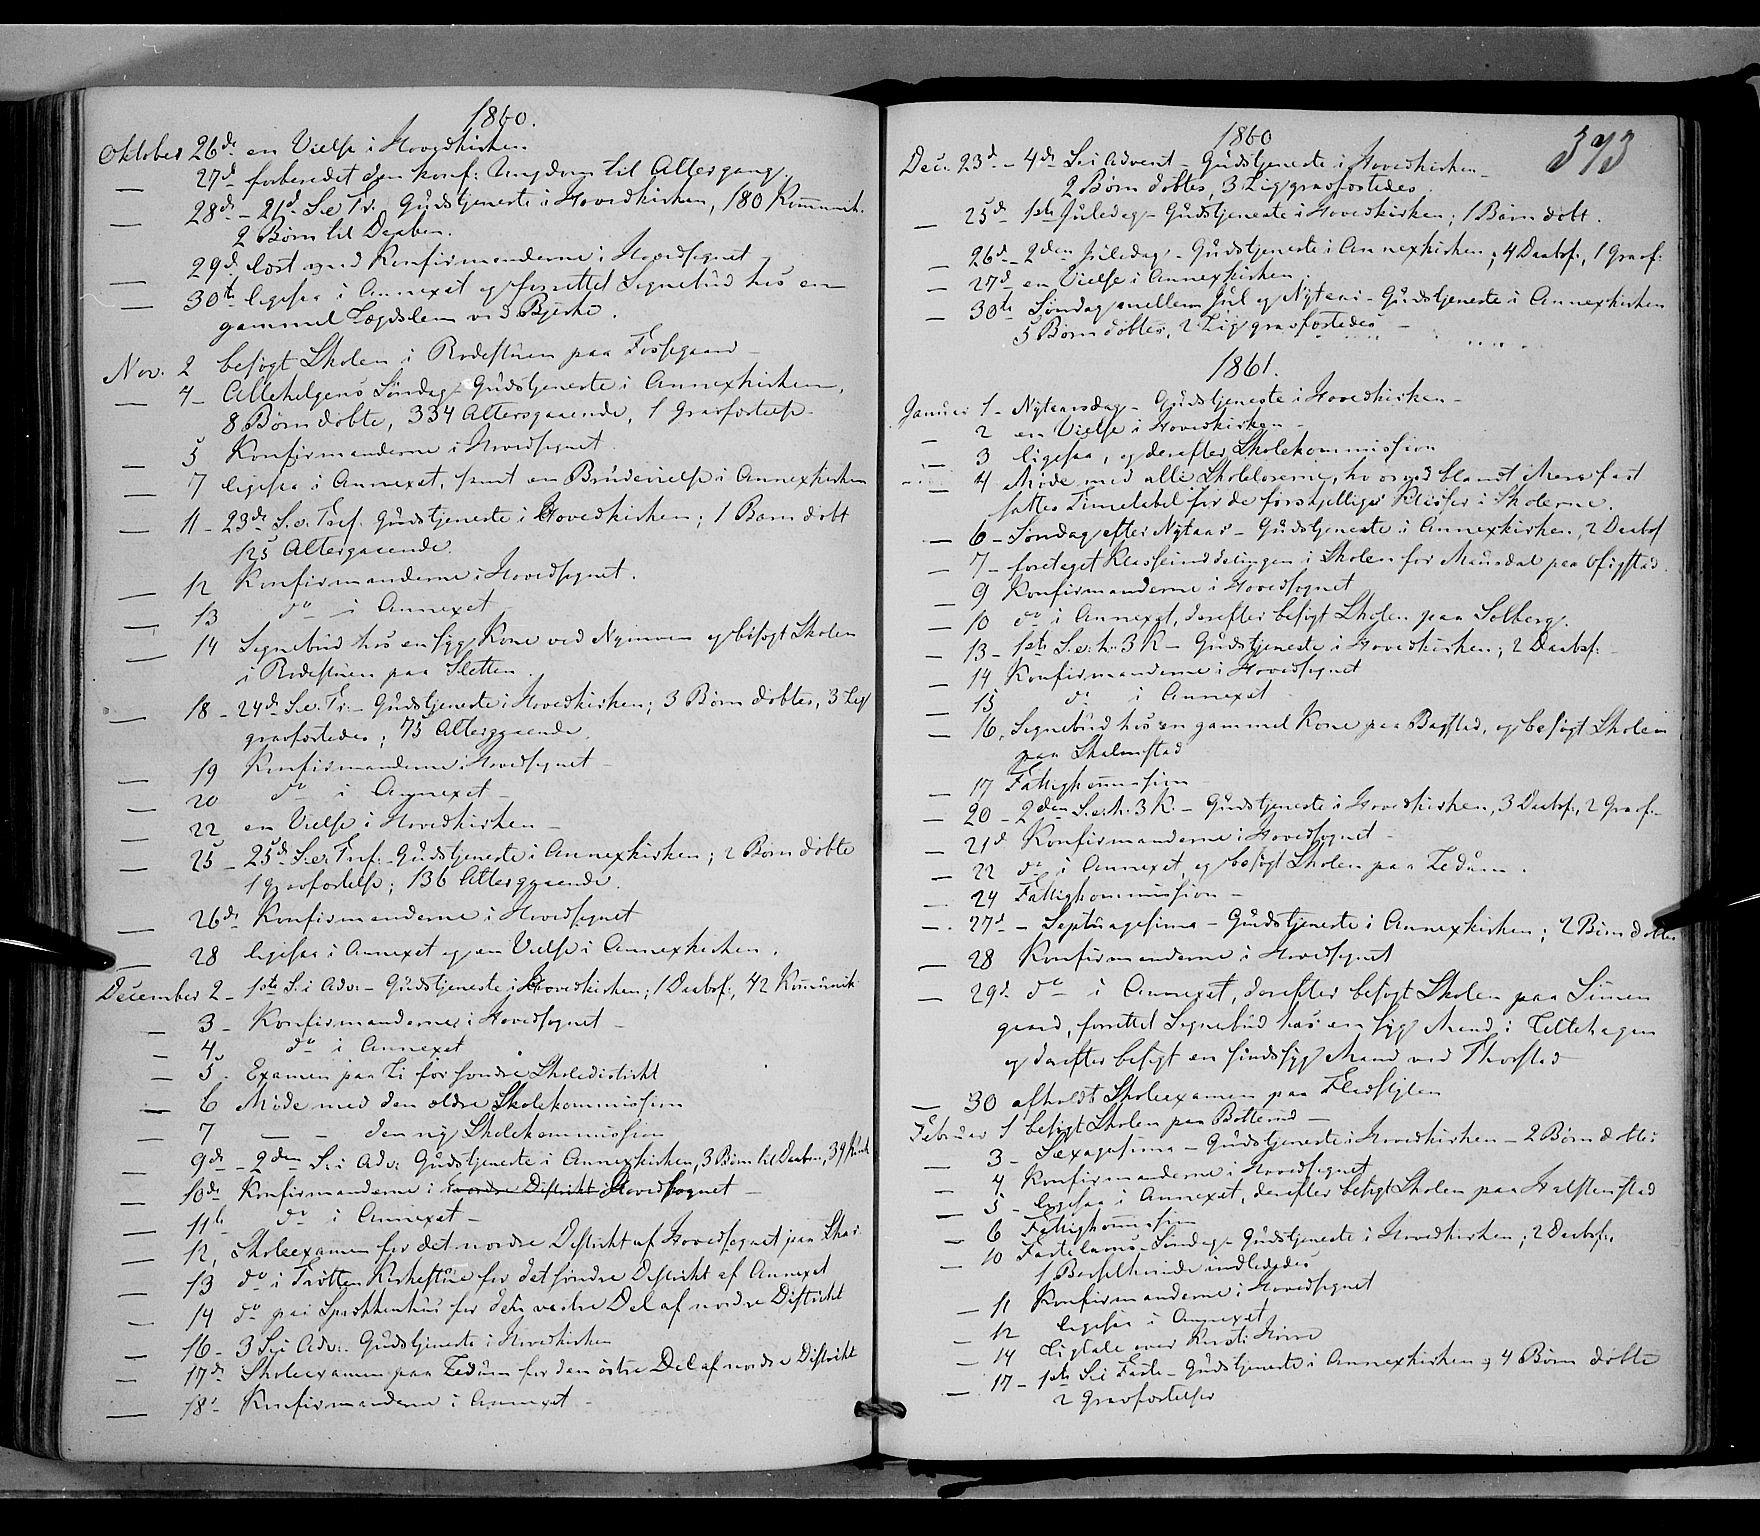 SAH, Øyer prestekontor, Ministerialbok nr. 6, 1858-1874, s. 373